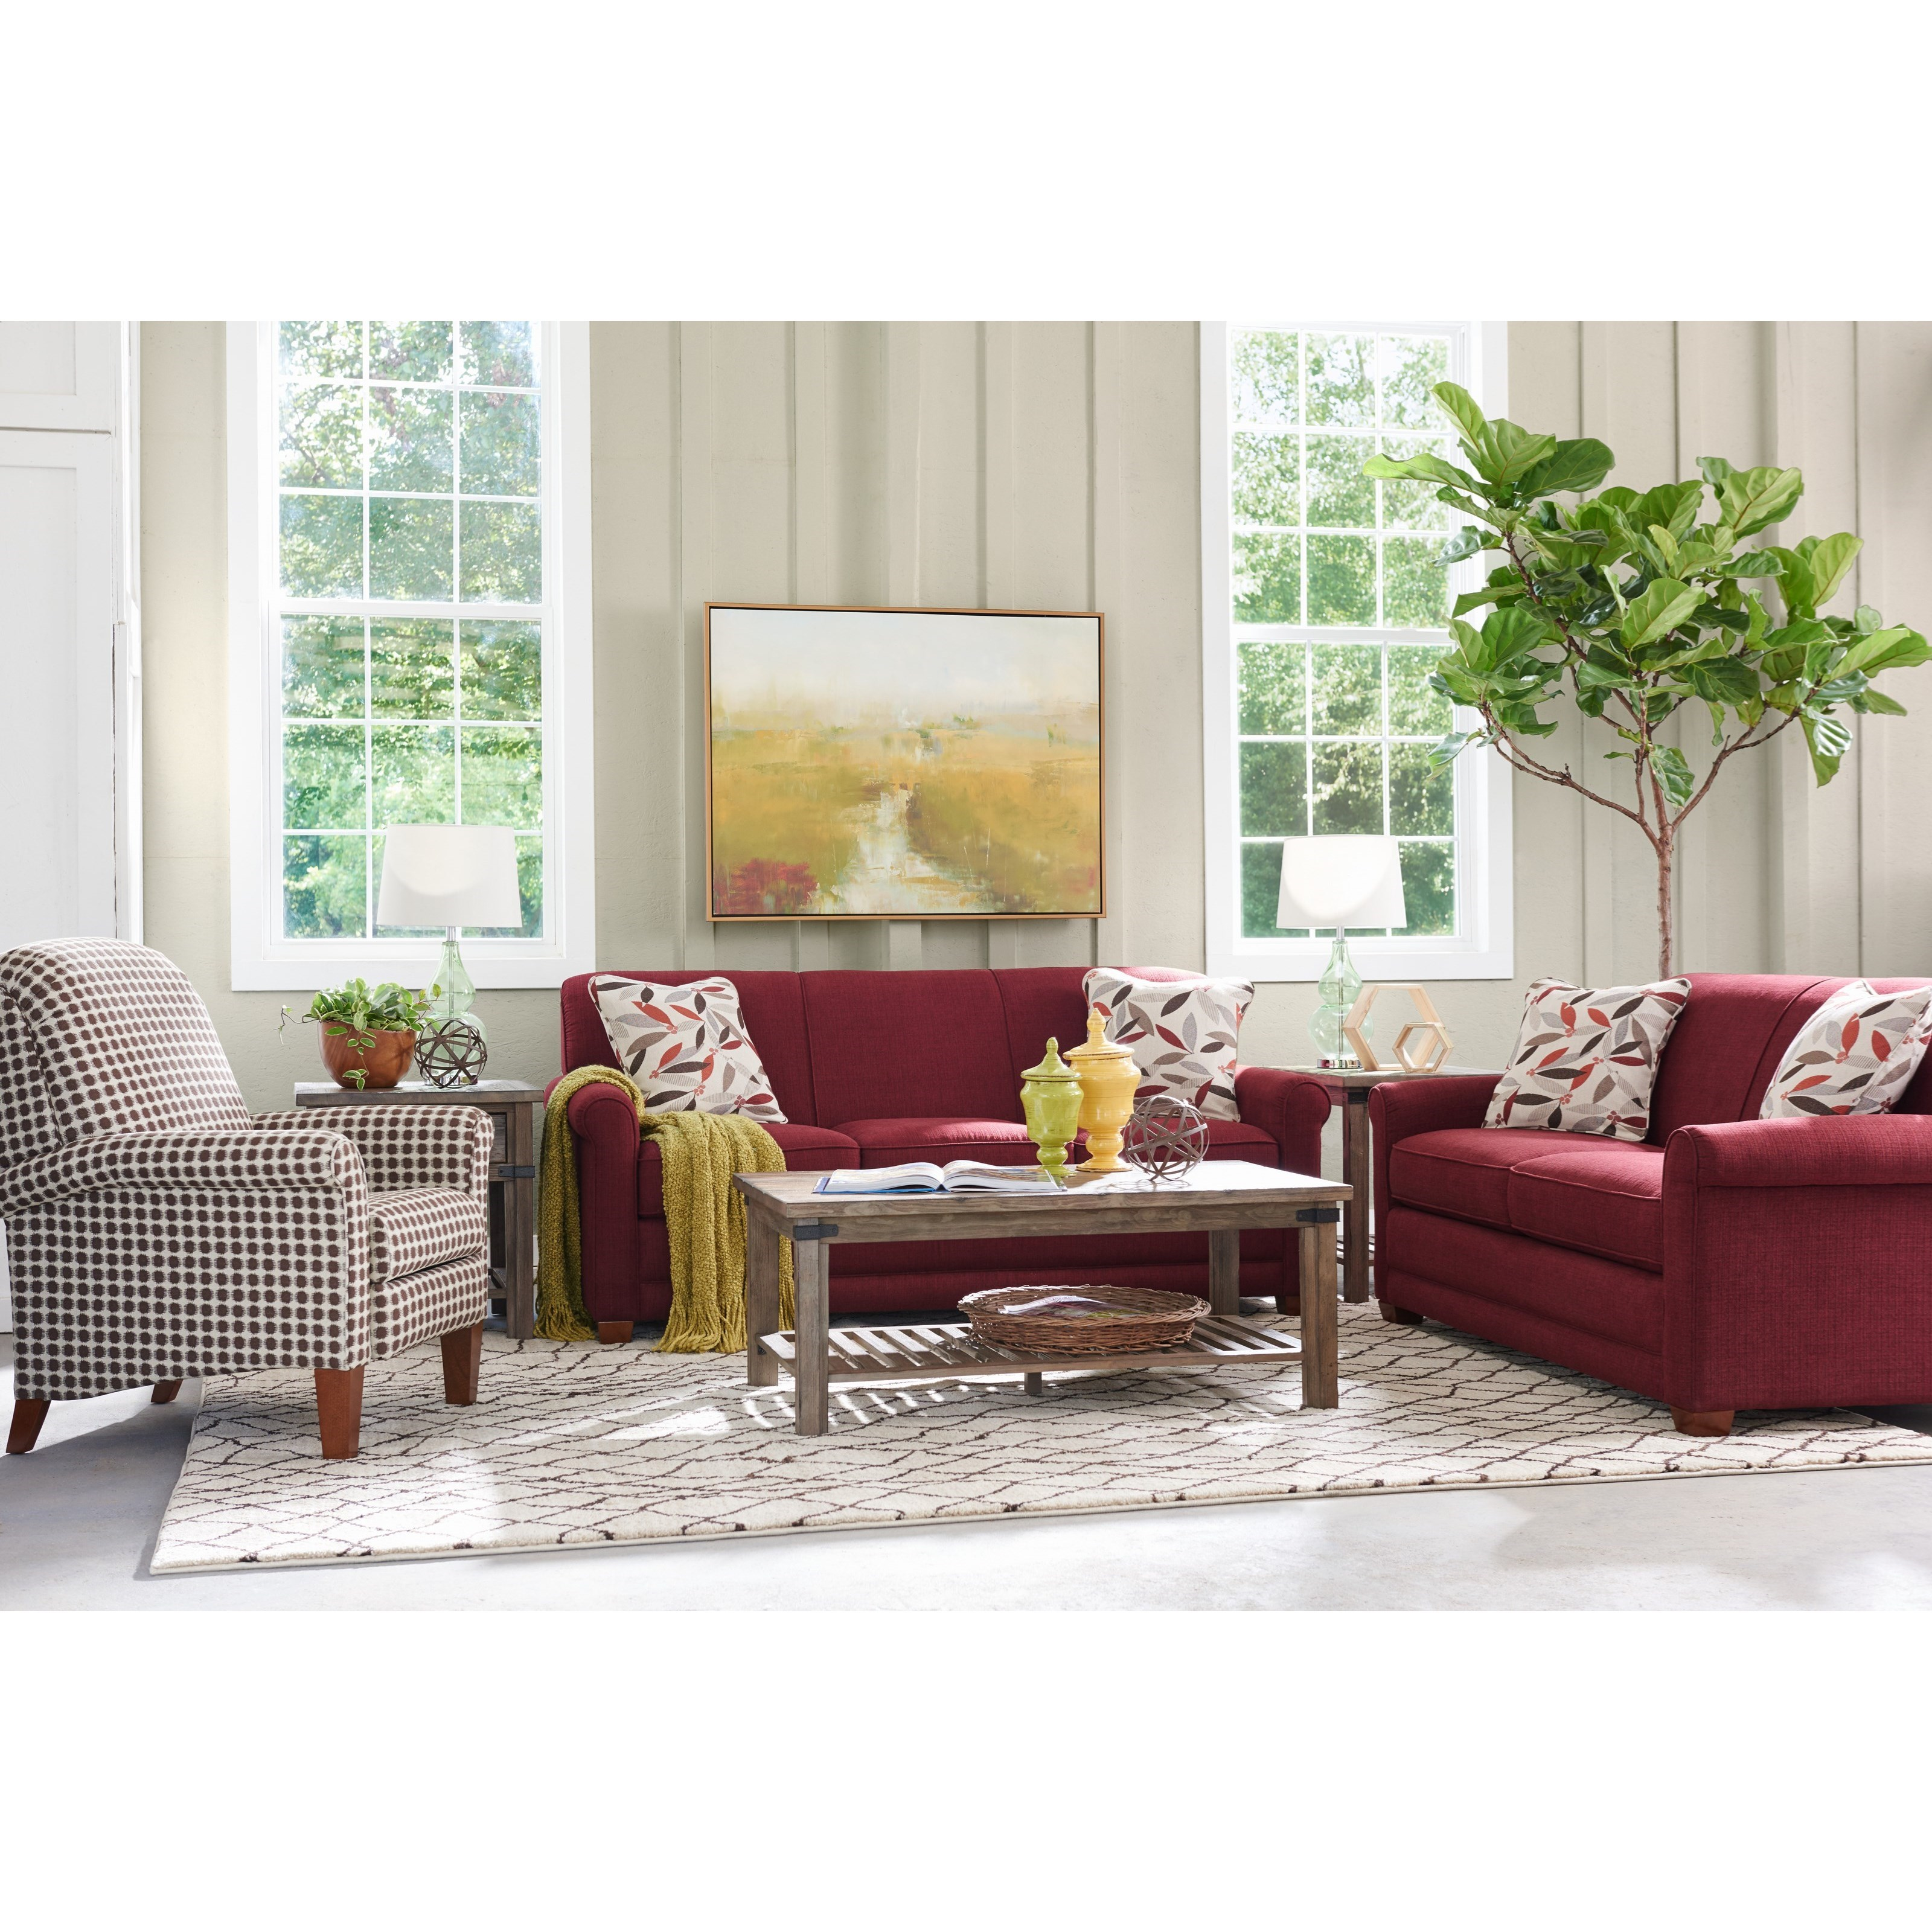 La-Z-Boy Amanda Casual Apartment-Size Sofa With Premier